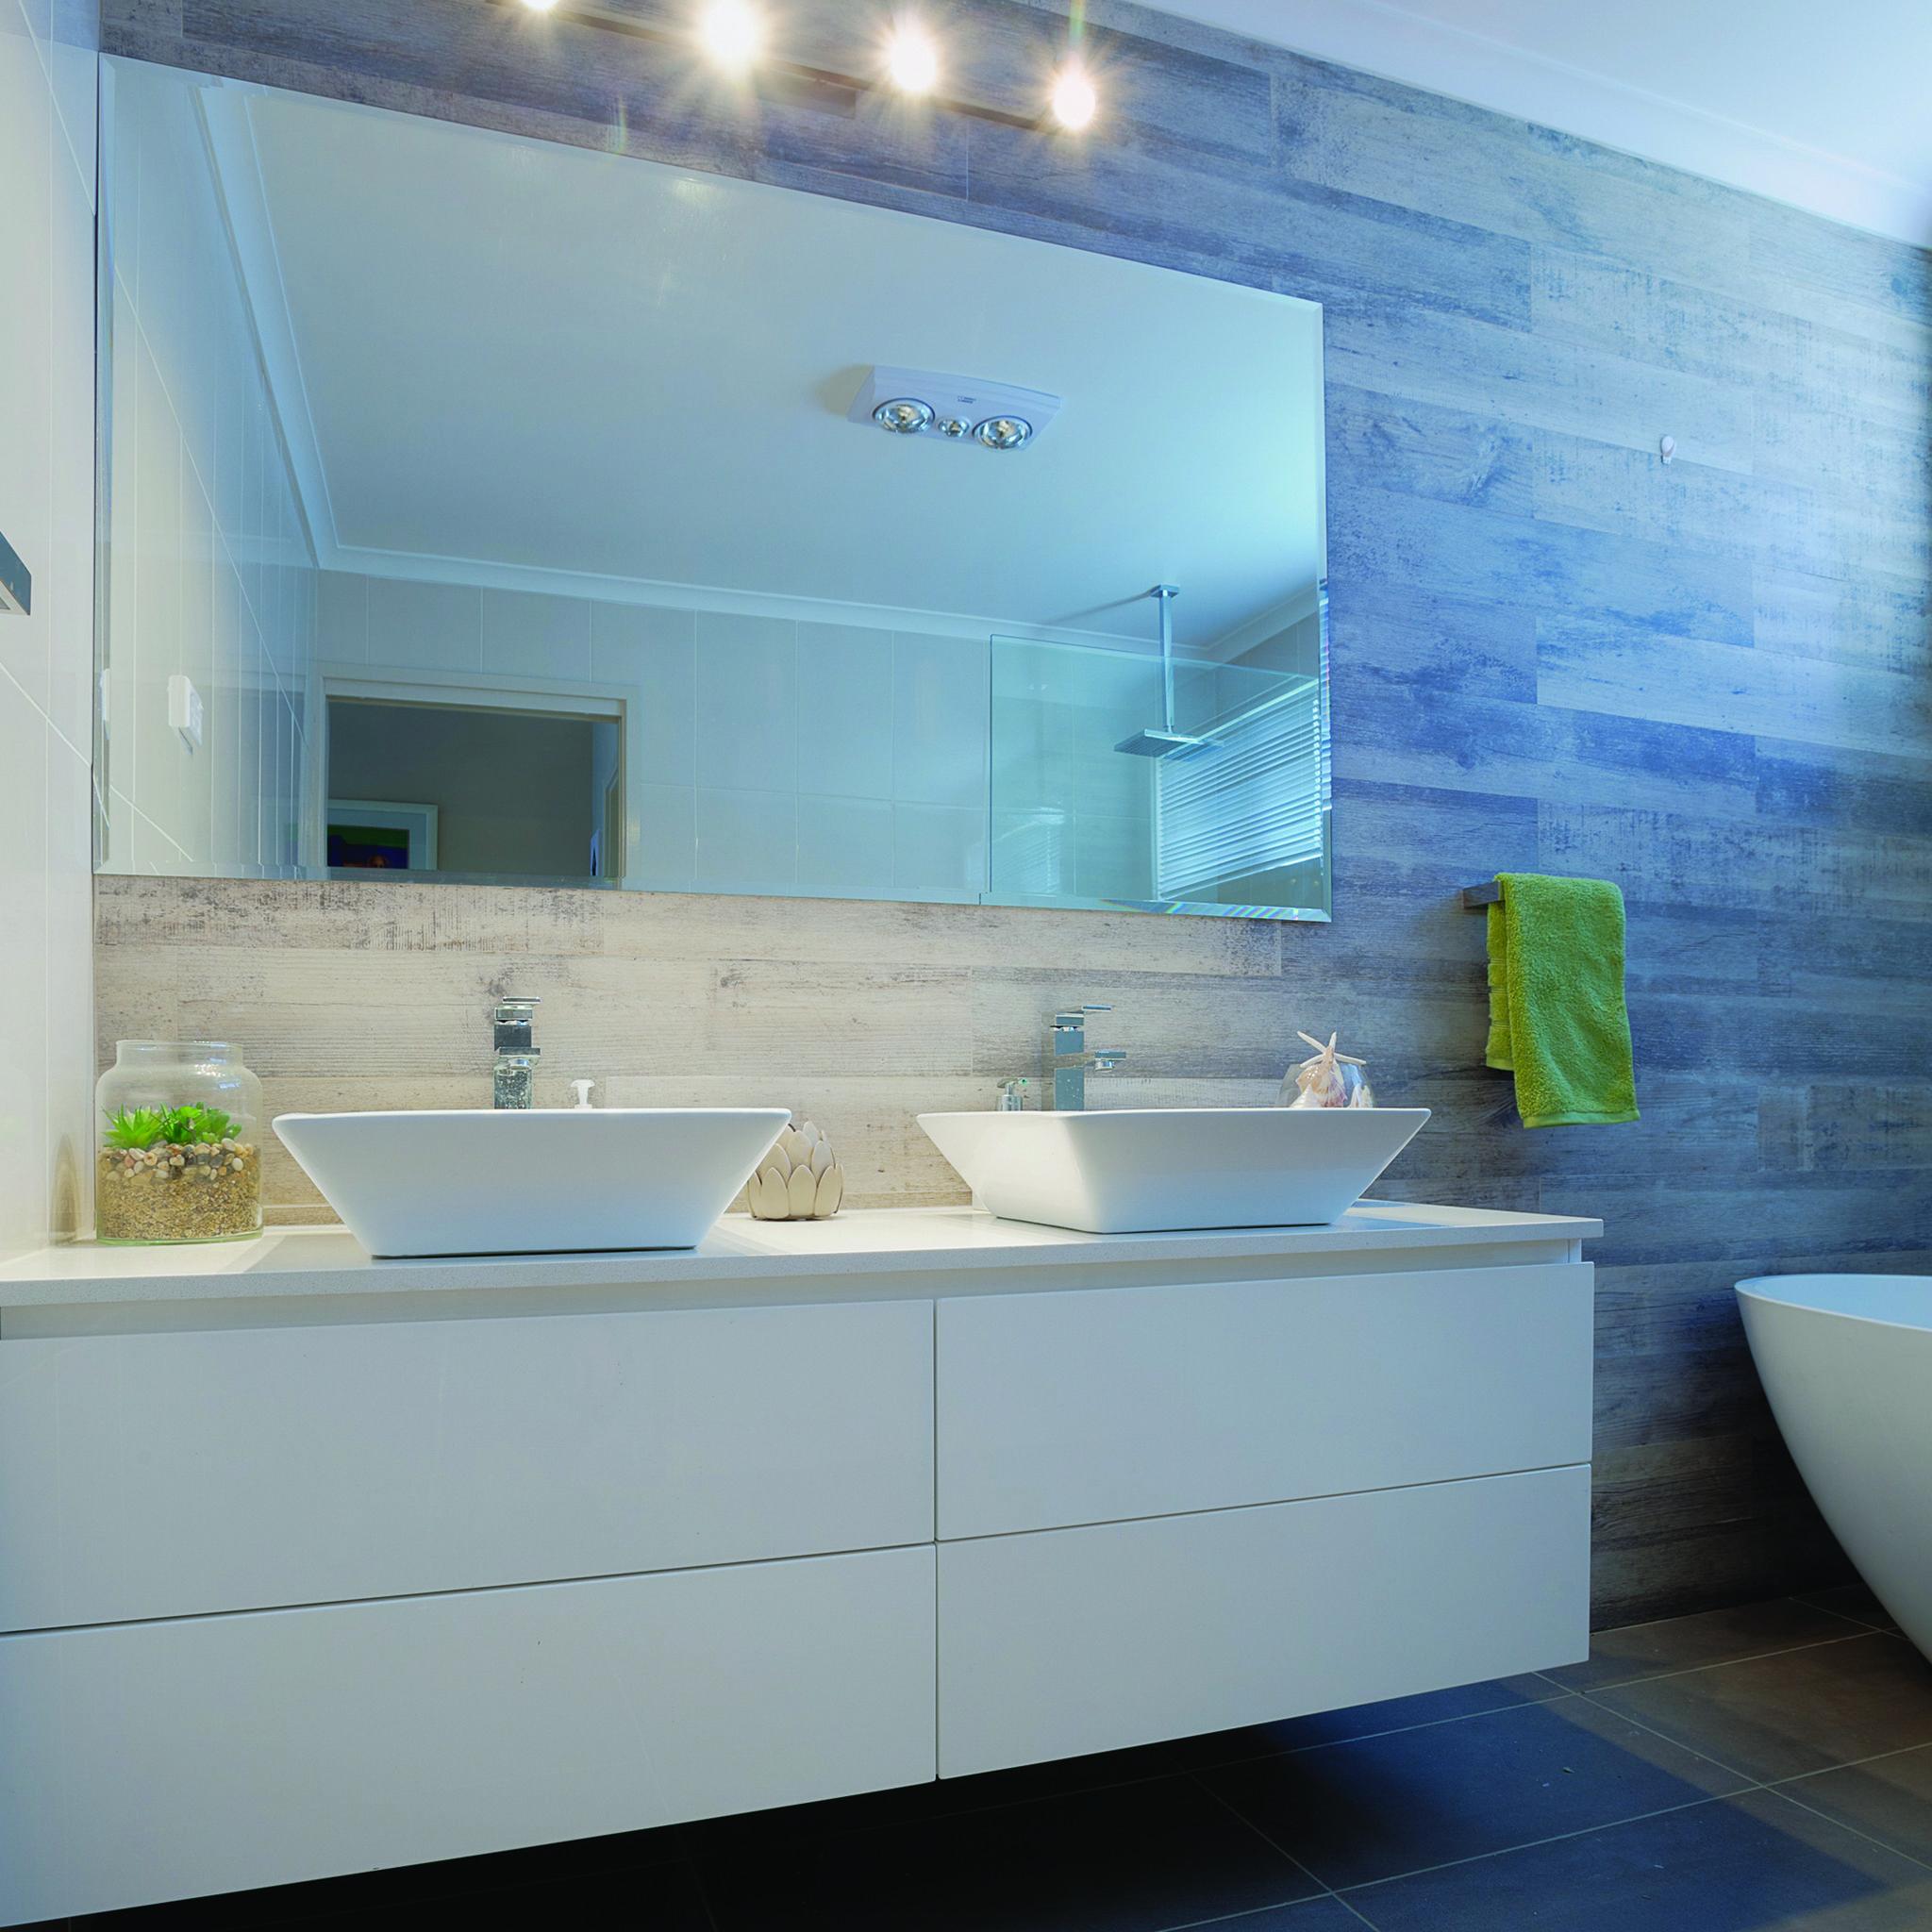 in bar tile timber light ideas accessories full vanities size blendart tiles wood remodel shower grain applying bathrooms of floor pebble d with floors bathroom bath designs small porcelain look lowes